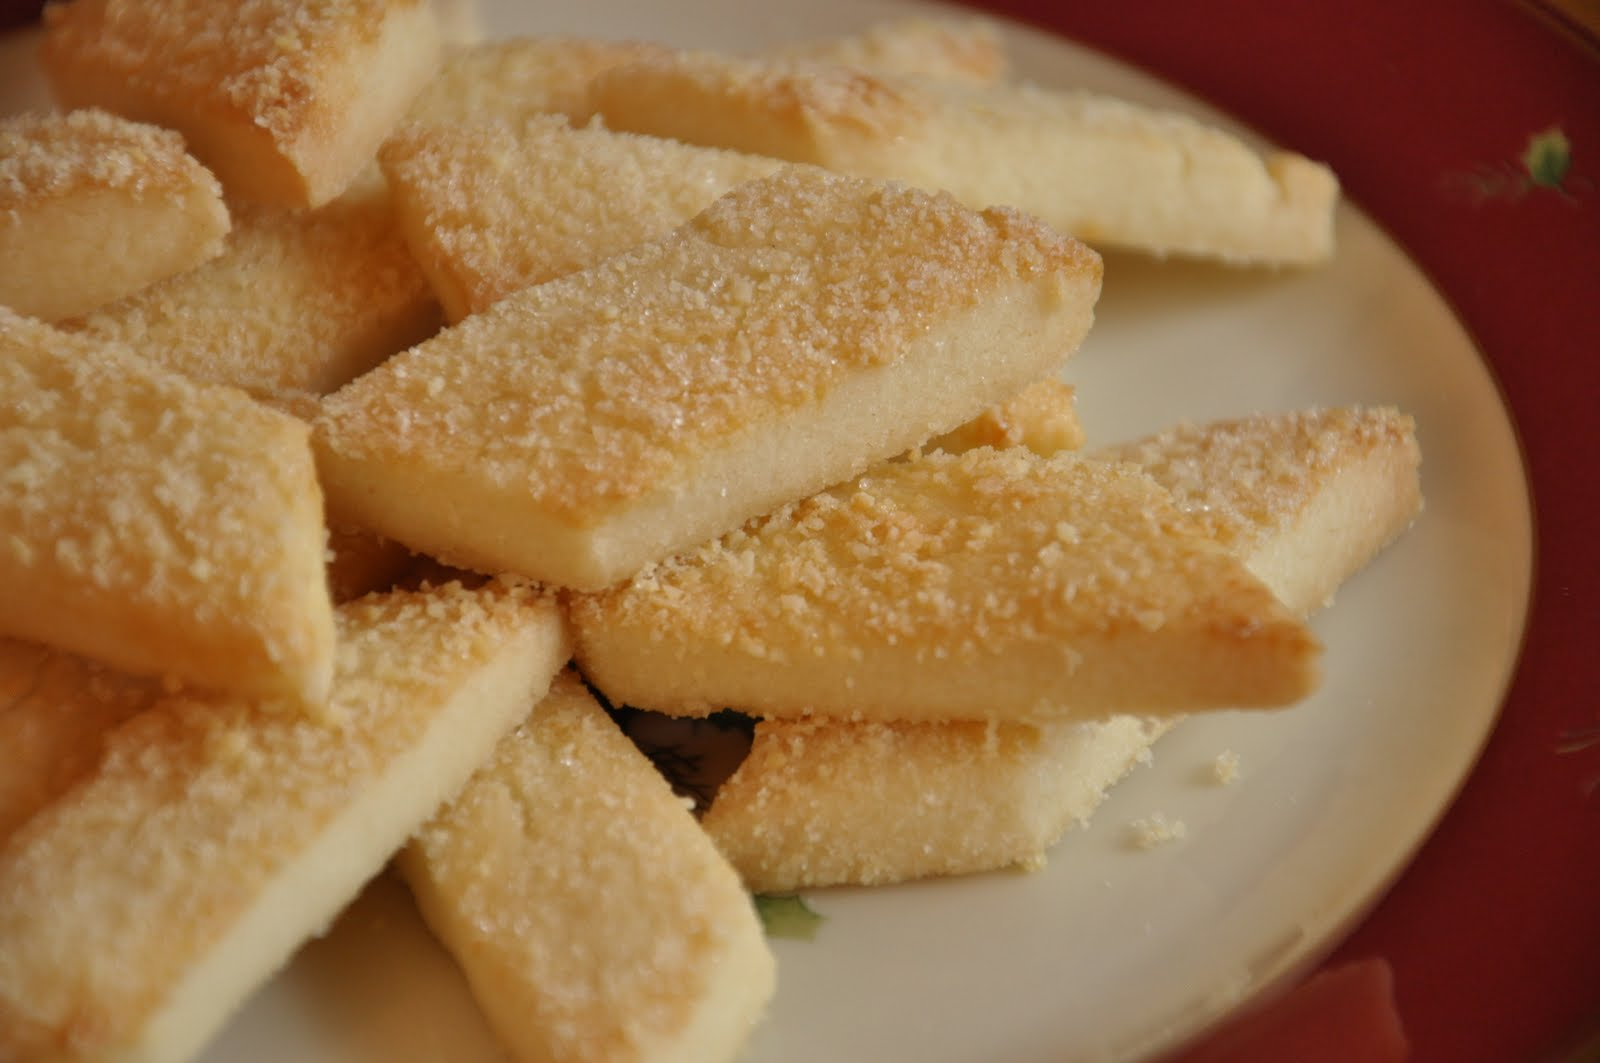 ... the Food of Love, Play On: Finskbrød - Denmark's Black Tie Shortbread